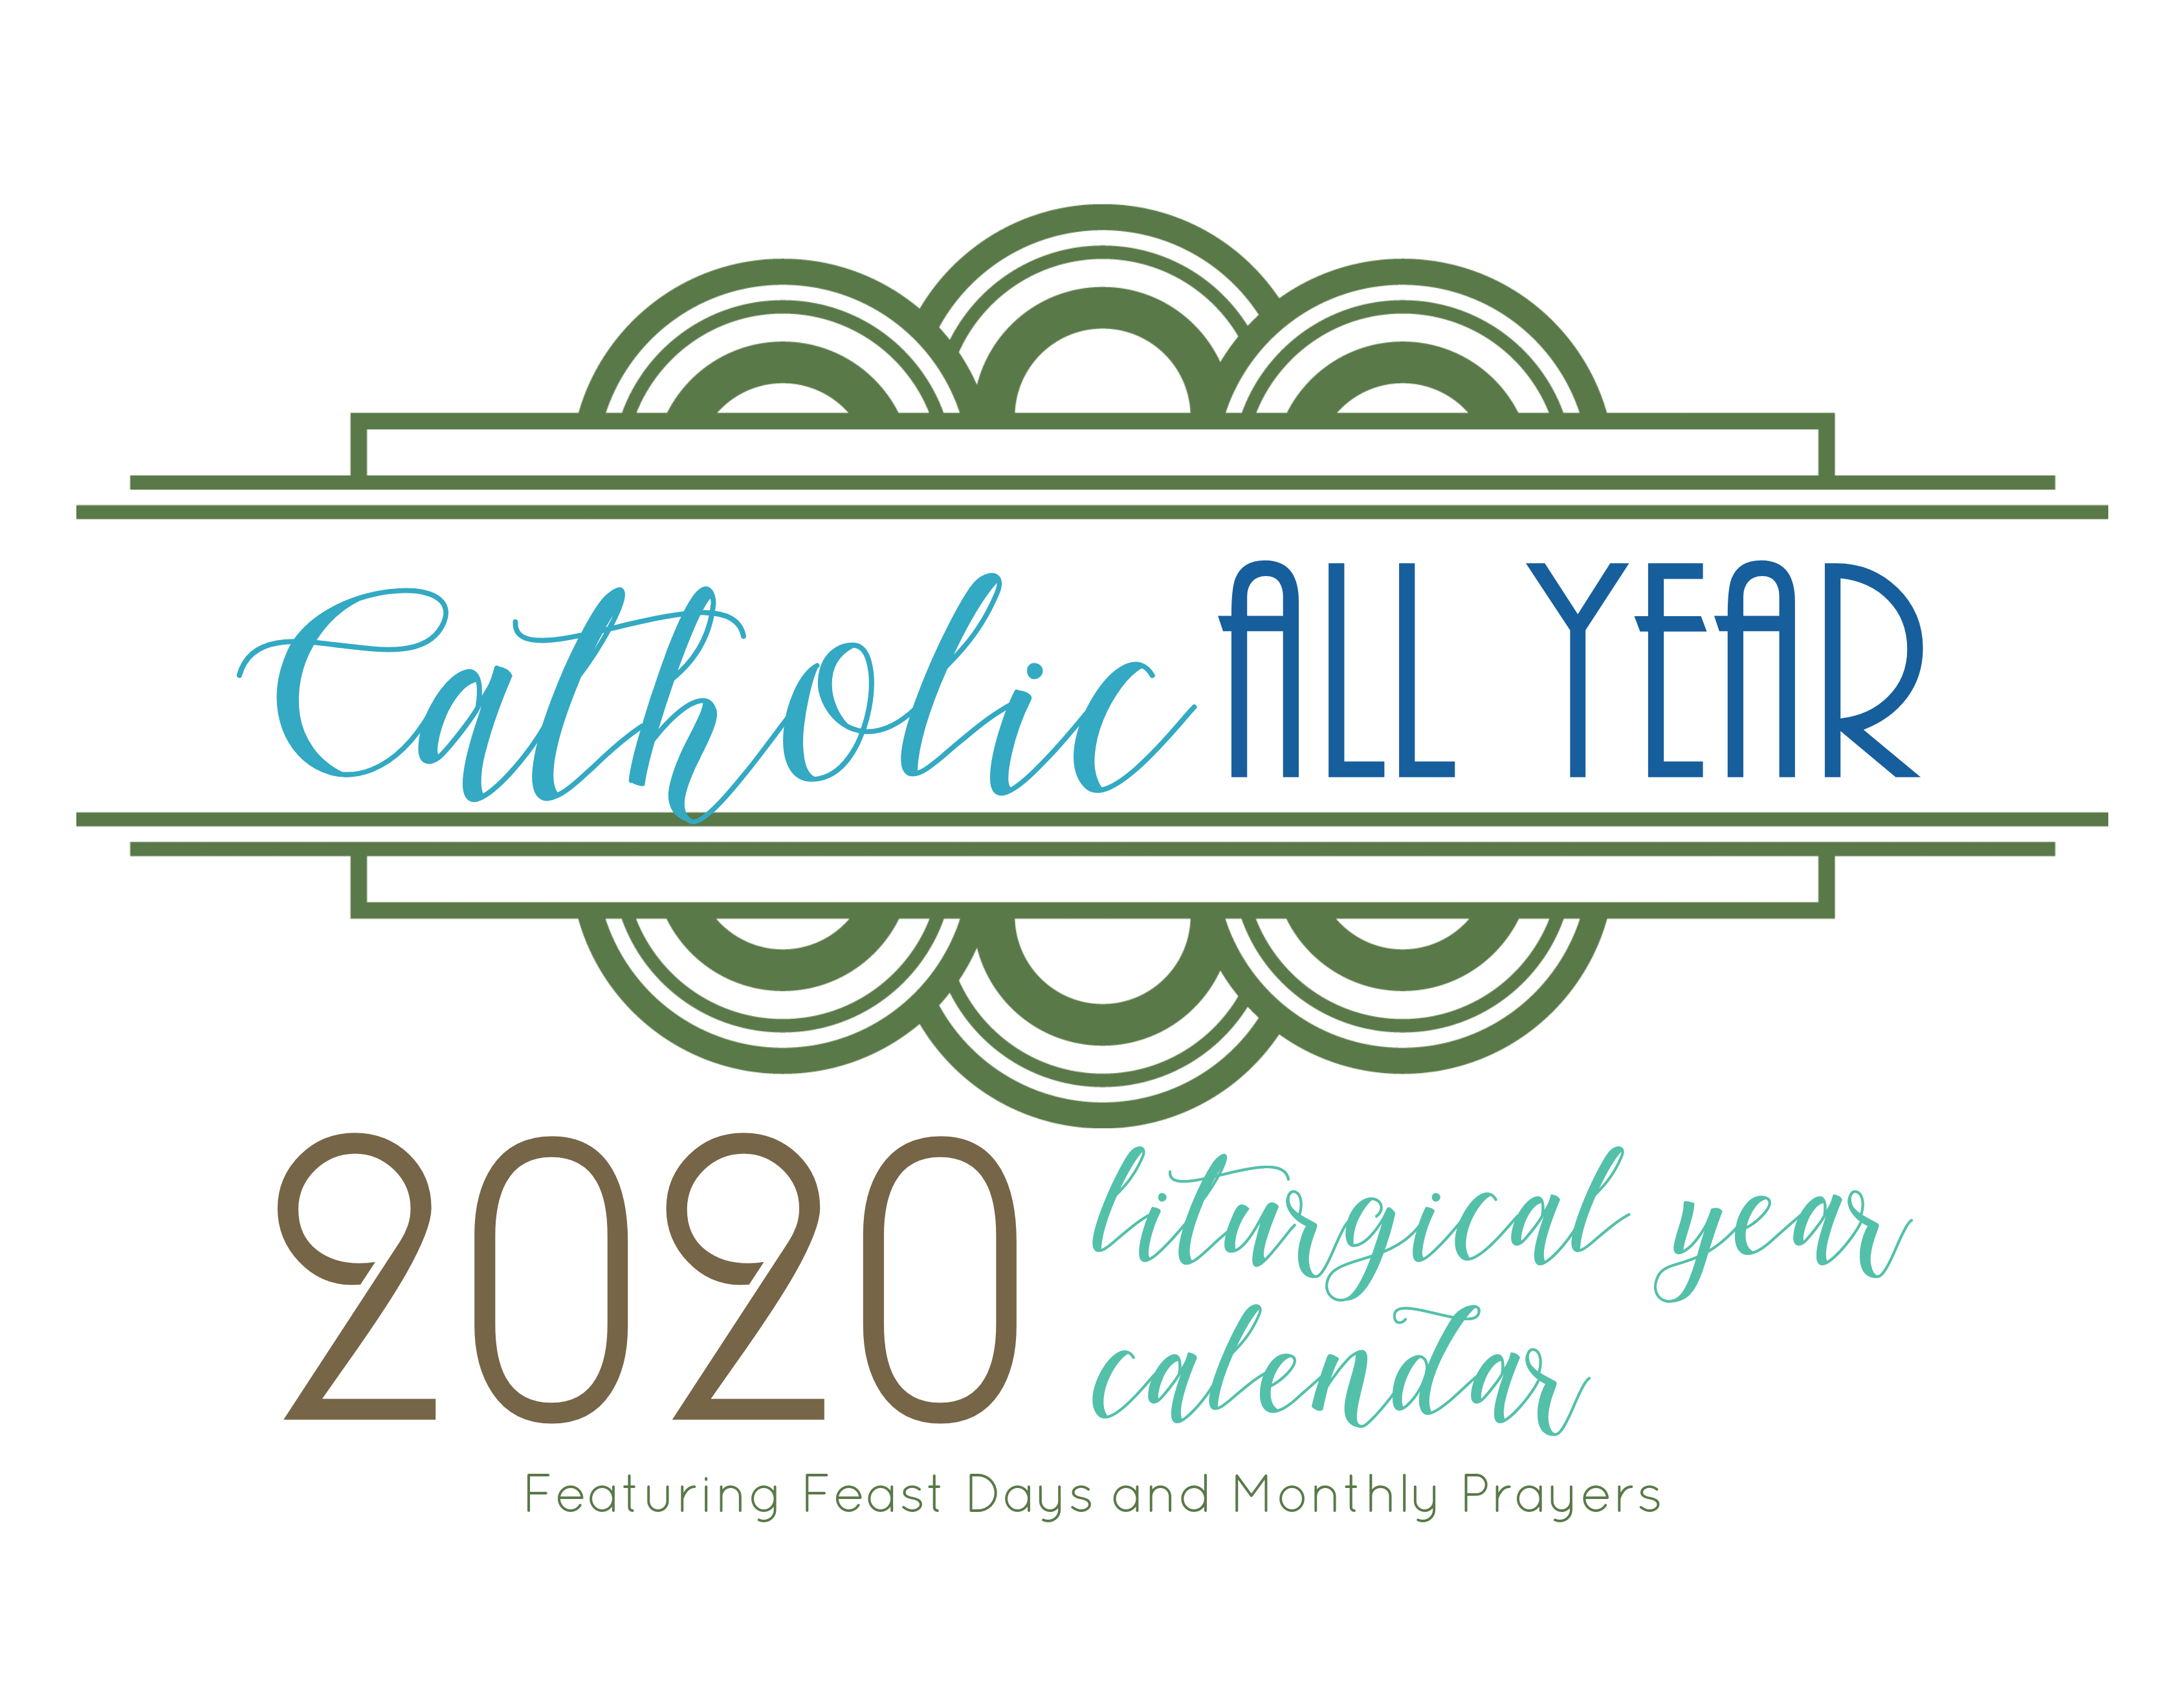 Catholic All Year 2020 Monthly Prayers Liturgical Year Calendar *digital  Download*